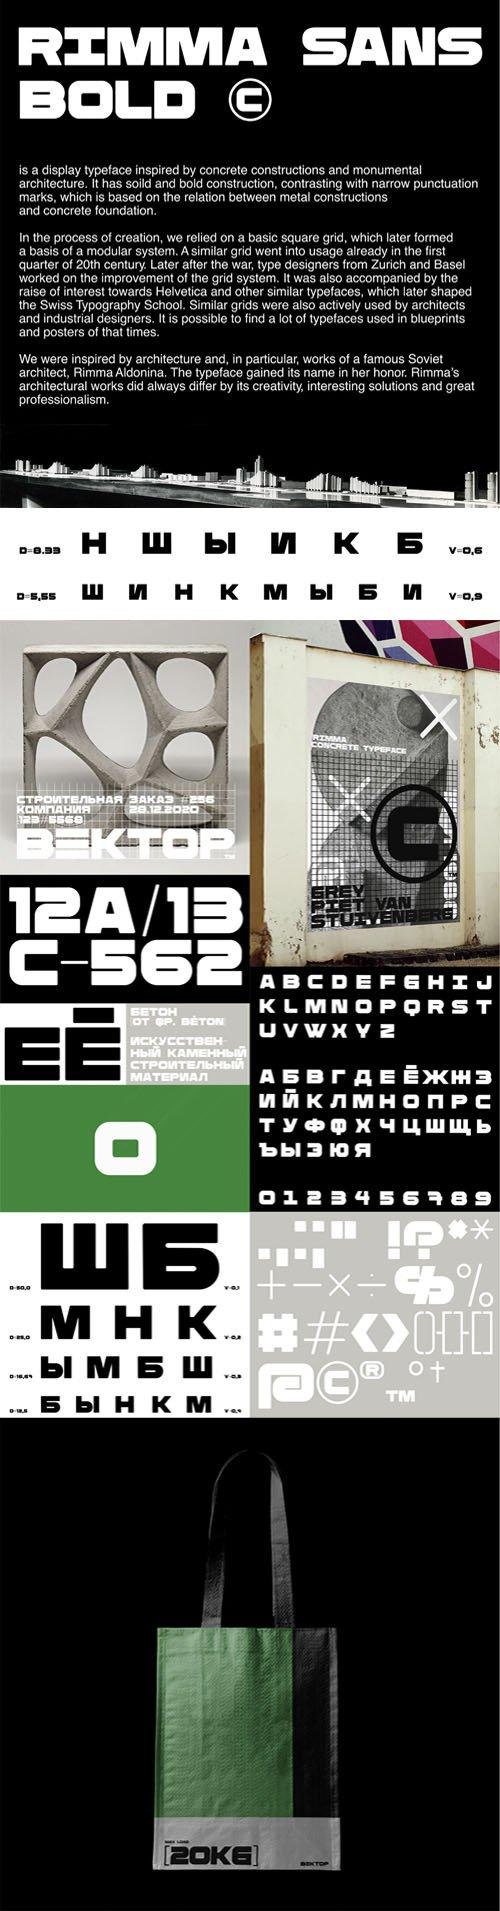 Rimma Sans Bold Typeface